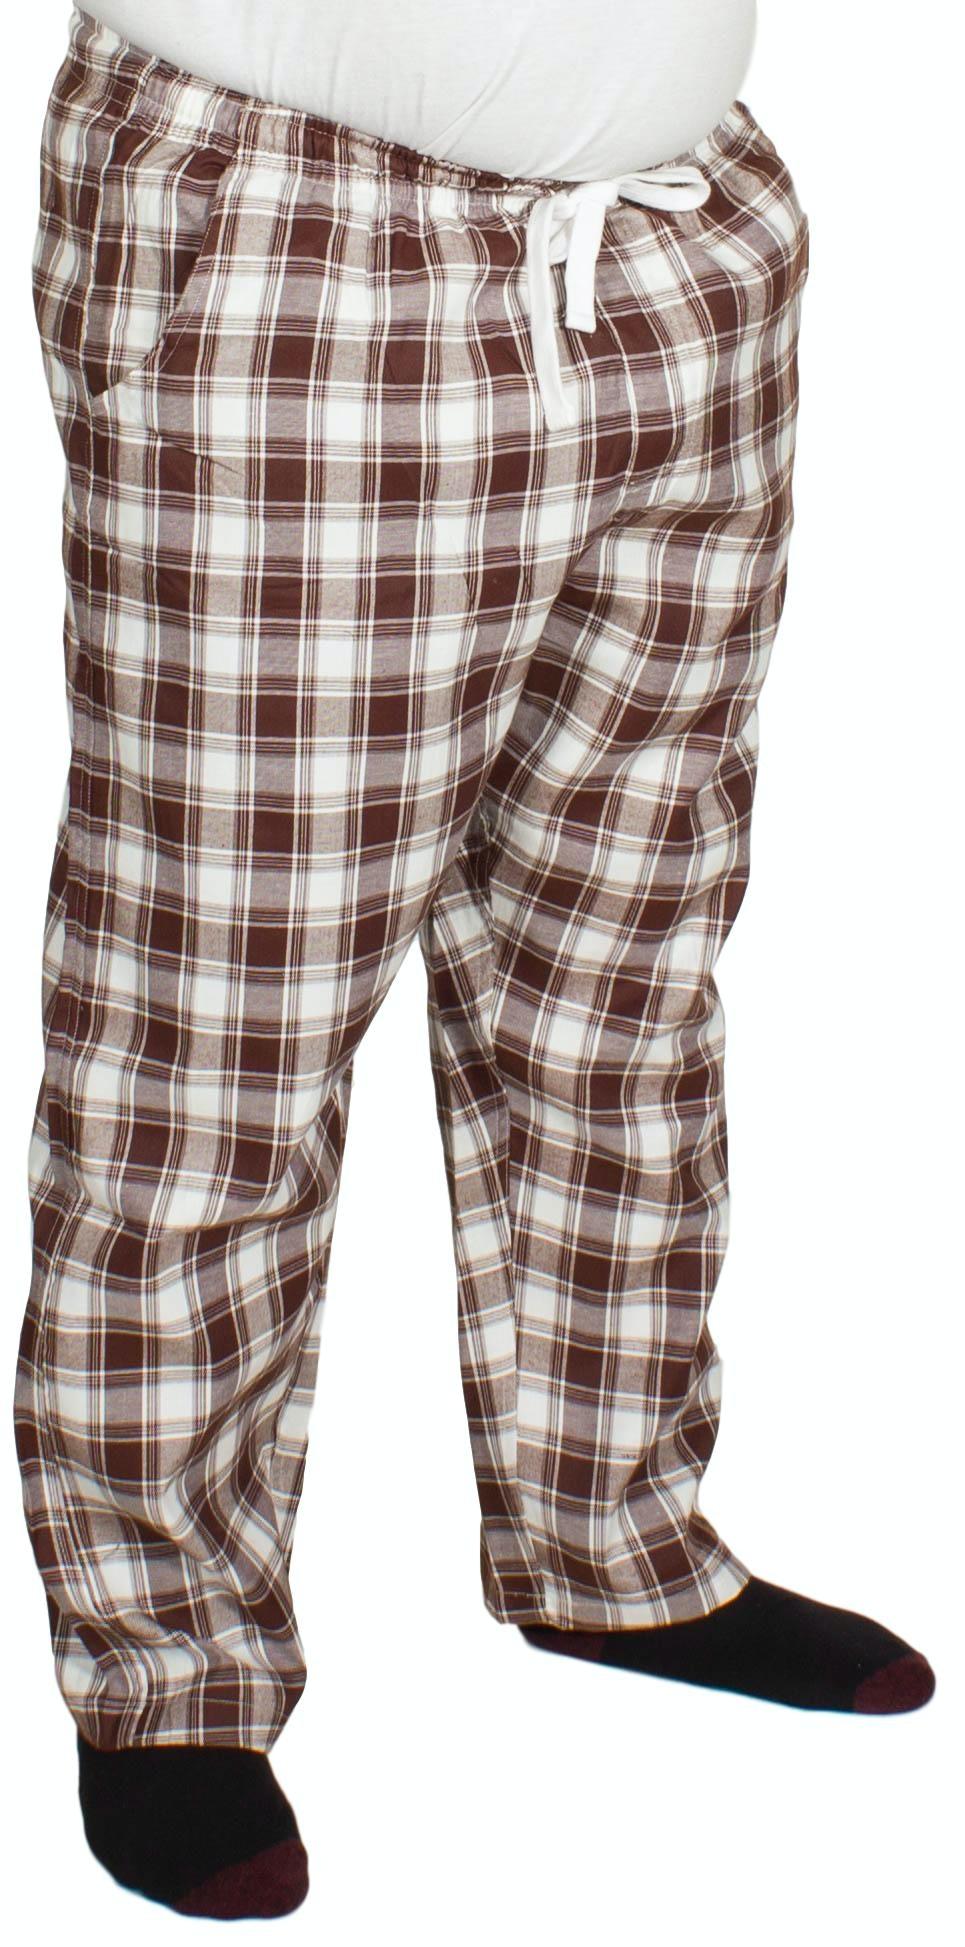 Bigdude Check Lounge Pants Brown/White